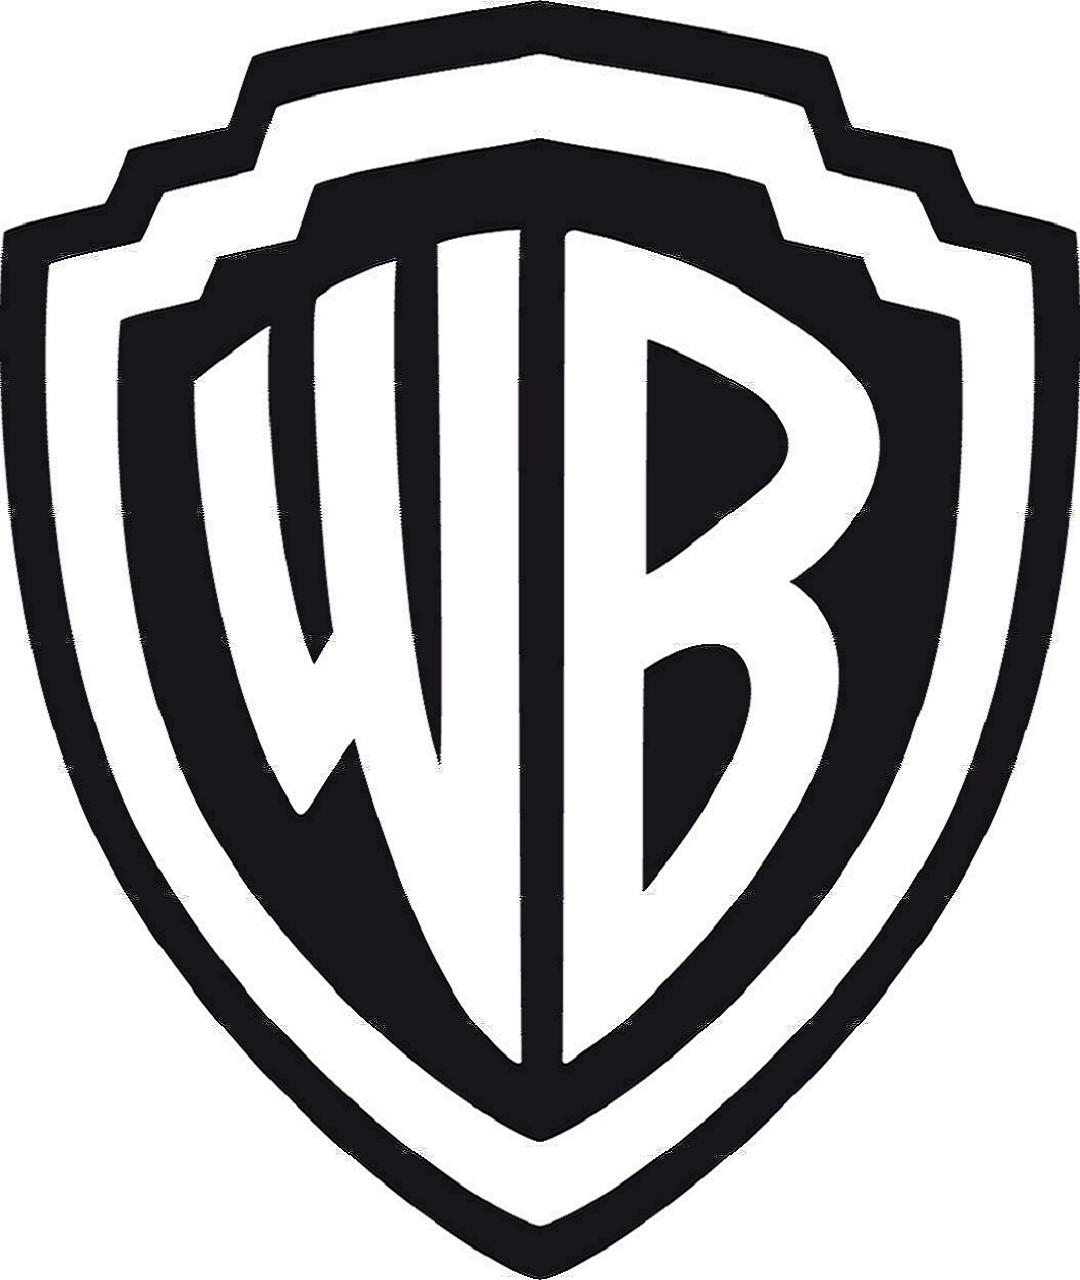 Warner Bros Records Logopedia Fandom Powered By Wikia